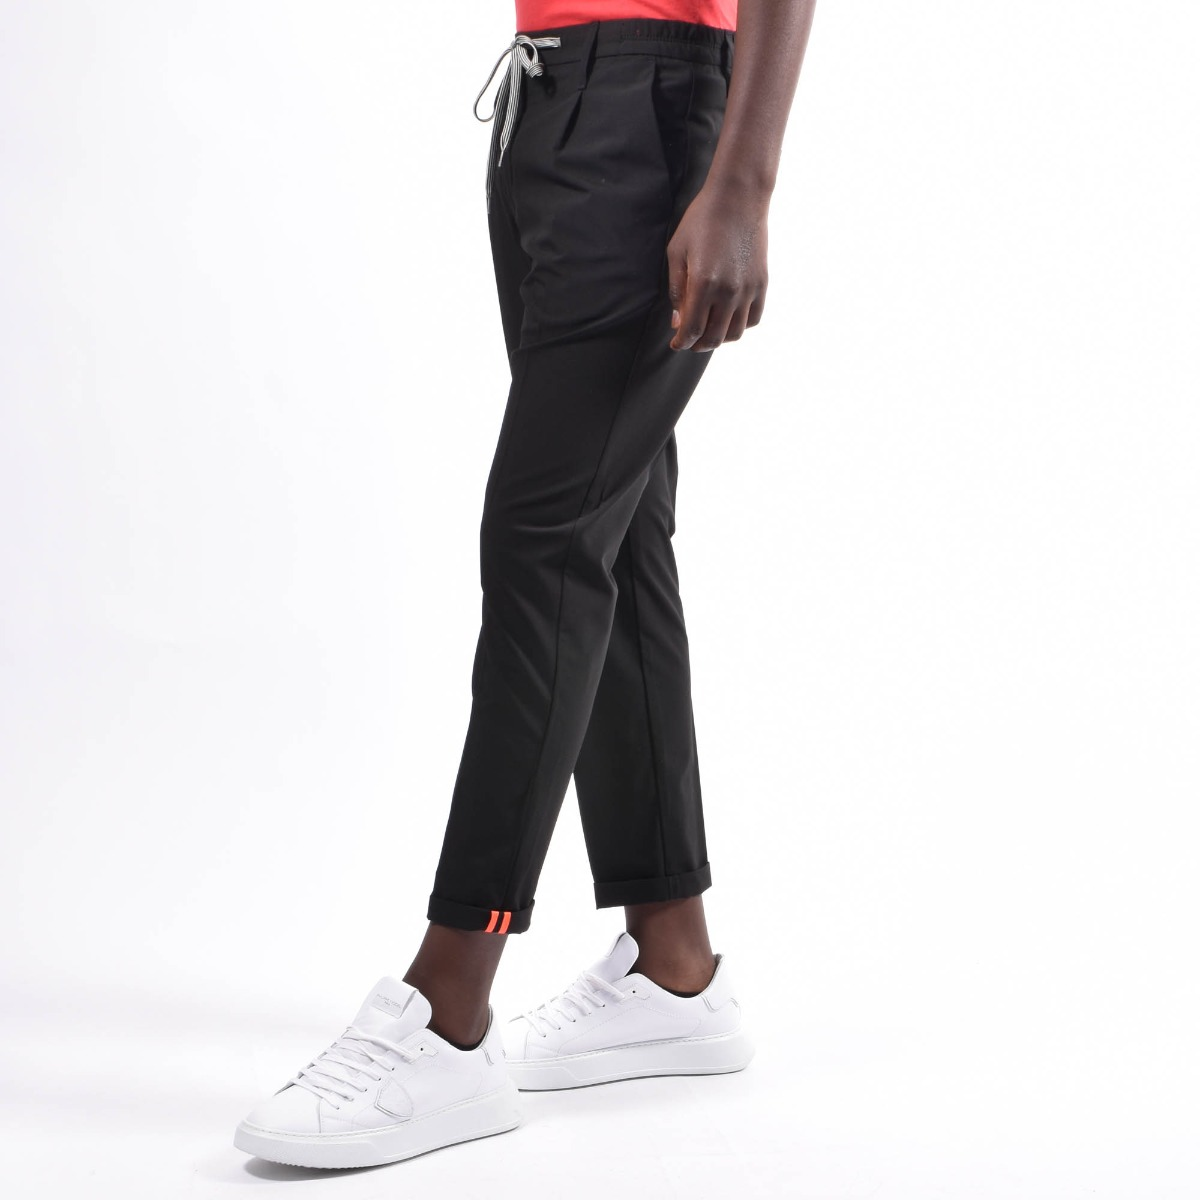 Pantalone con coulisse - Nero